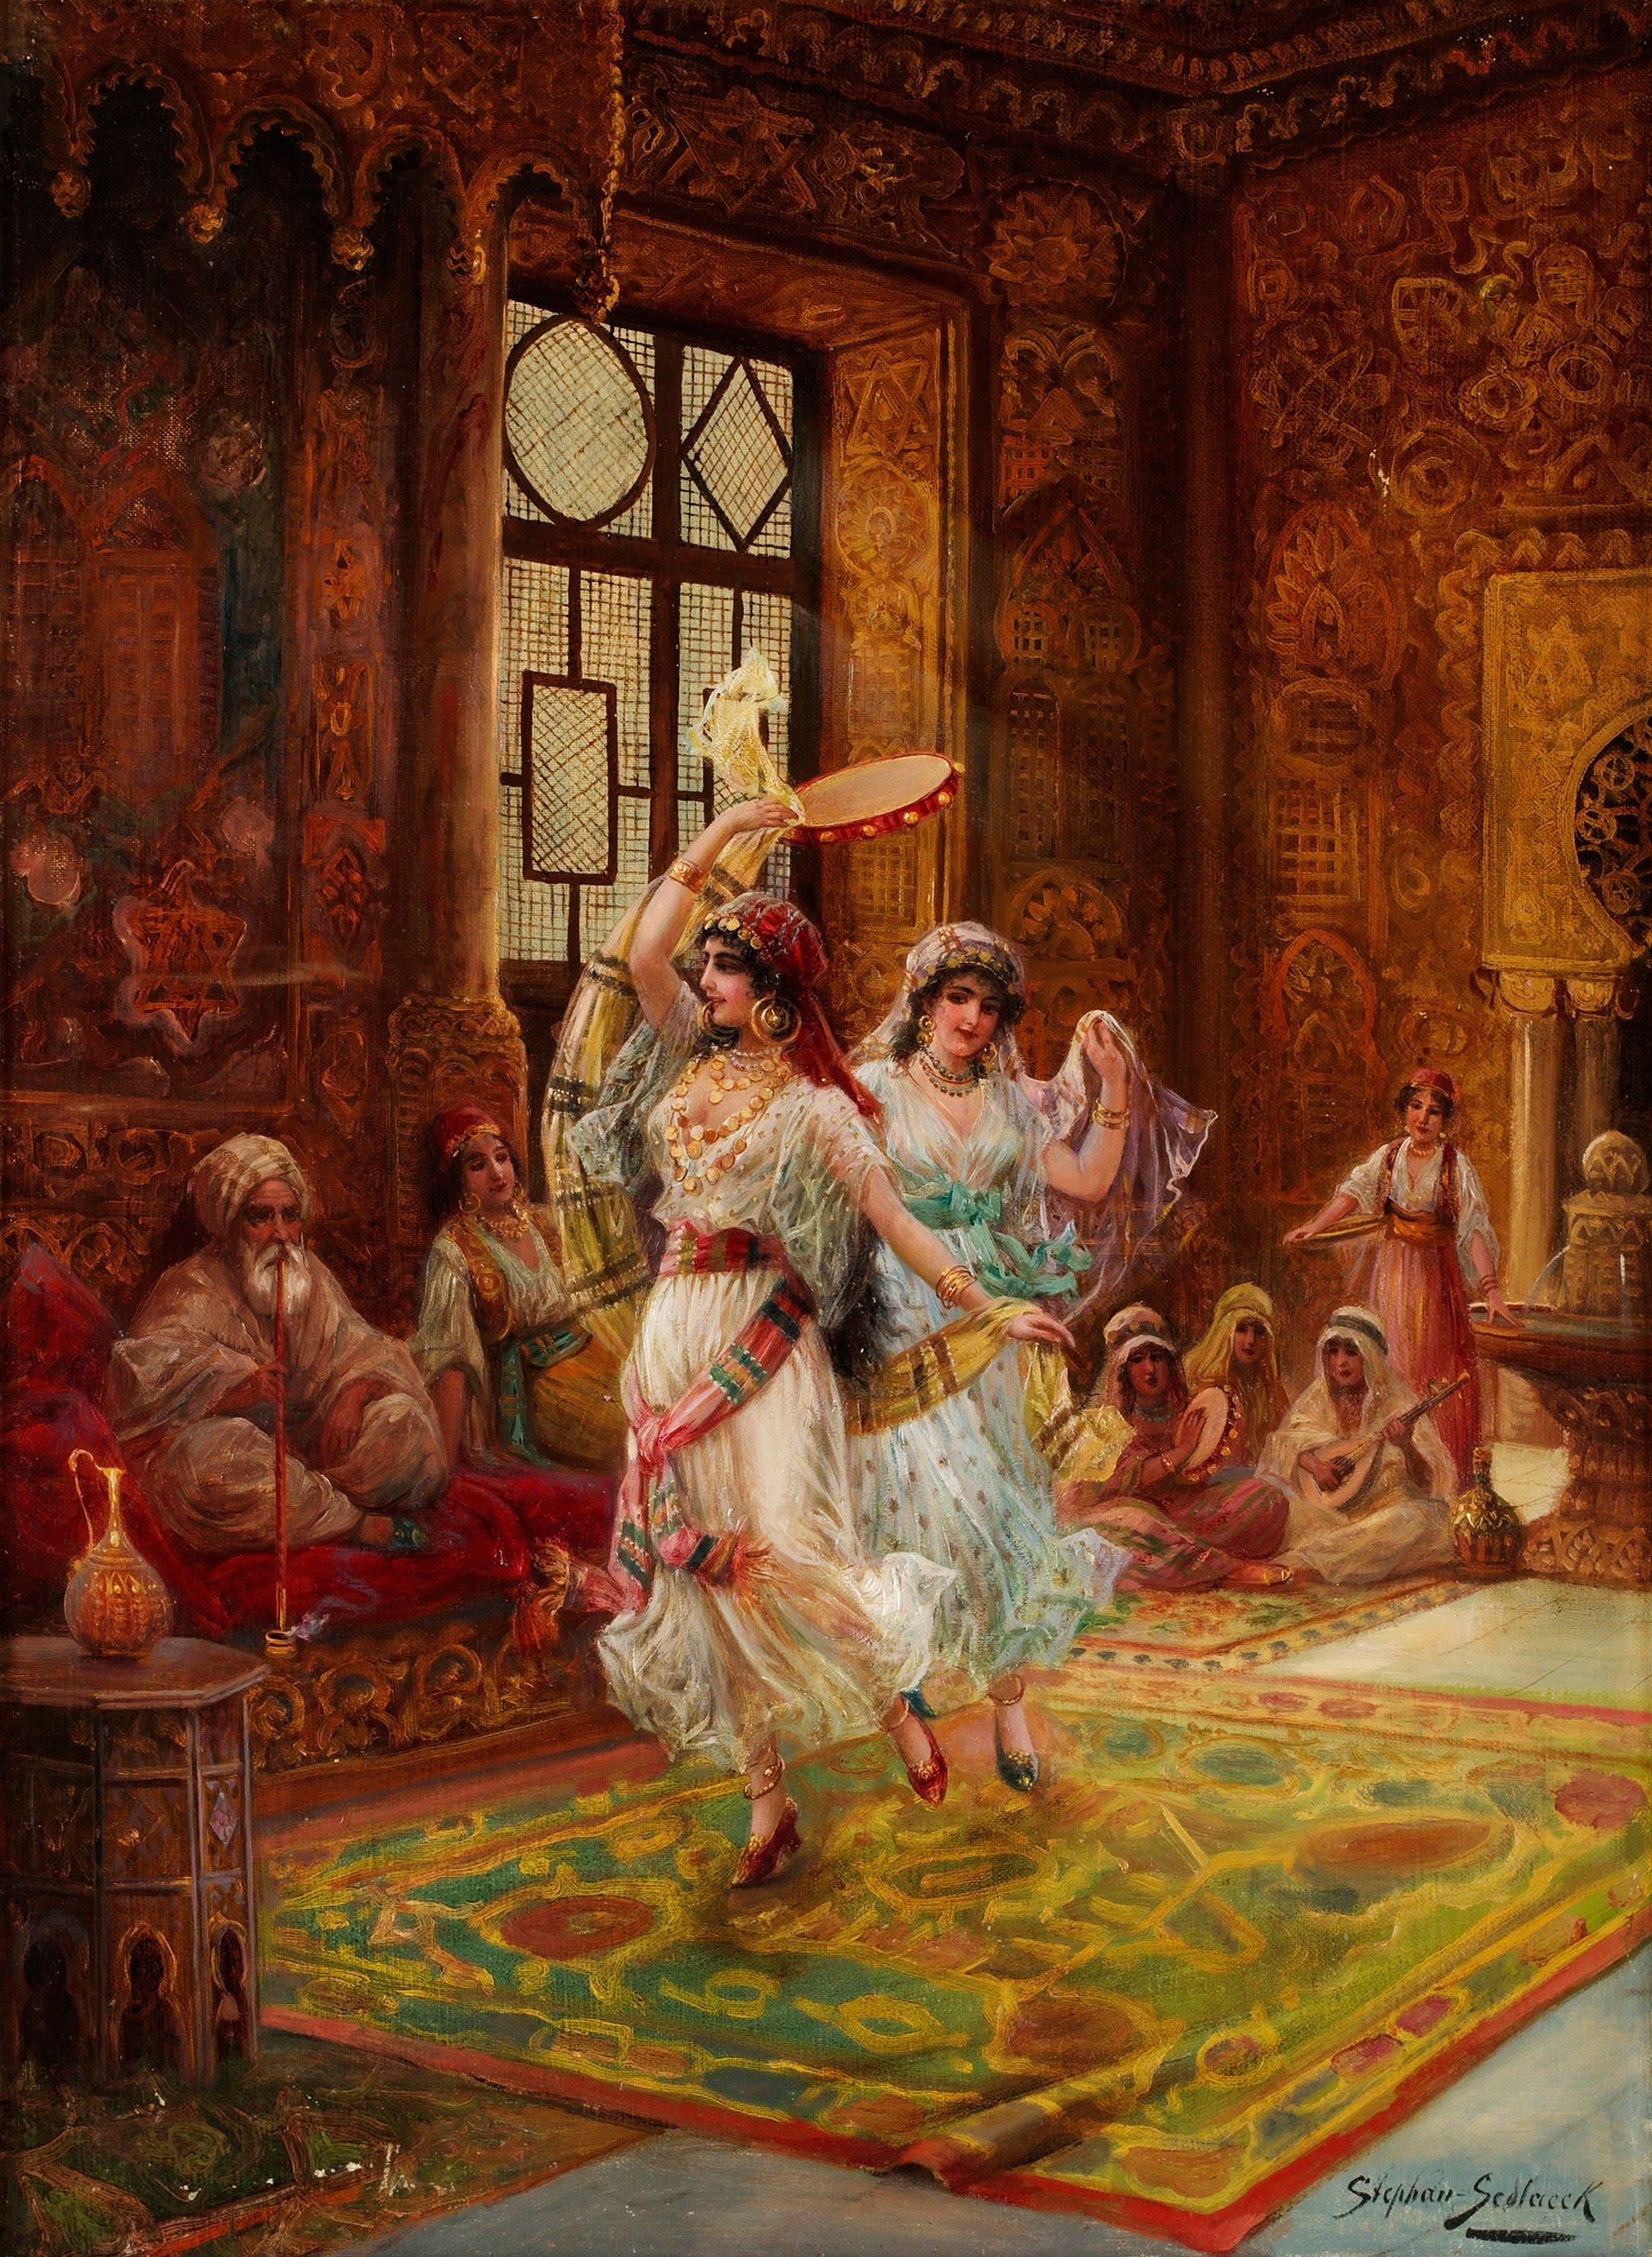 Harlem interior with dancing women